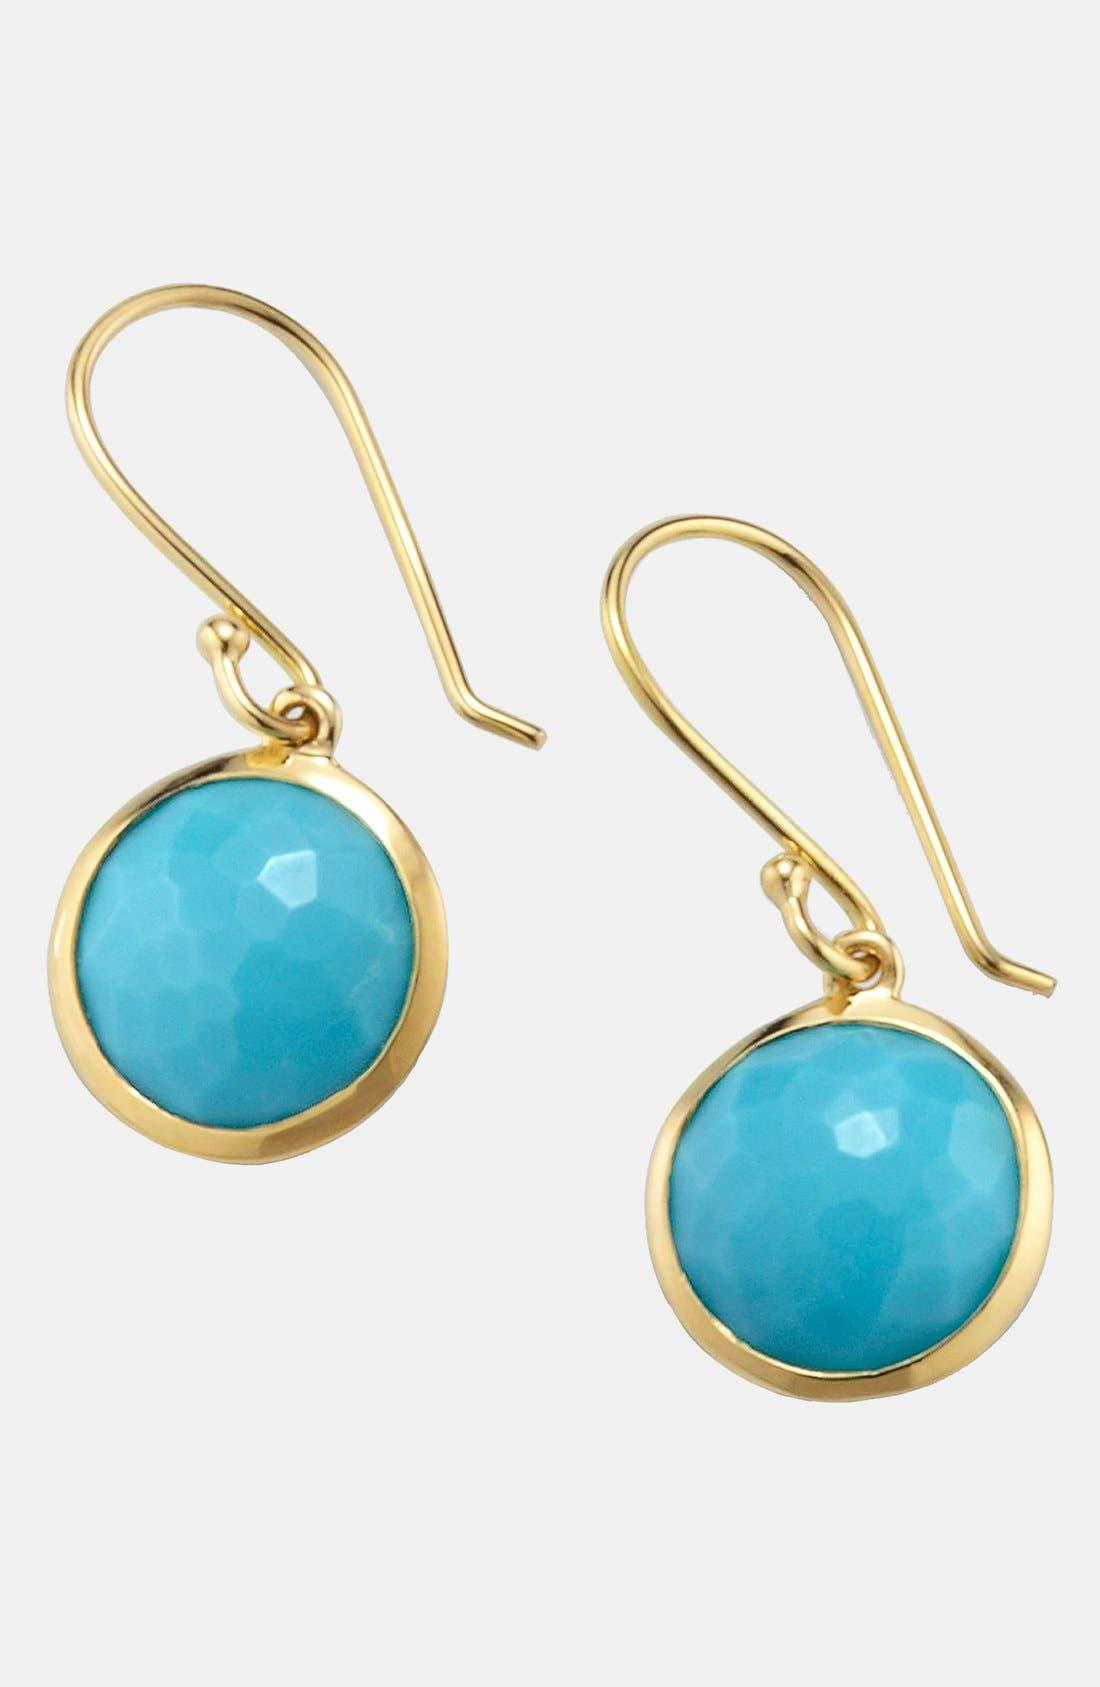 'Rock Candy - Mini Lollipop' 18k Gold Drop Earrings,                         Main,                         color, YELLOW GOLD/TURQUOISE